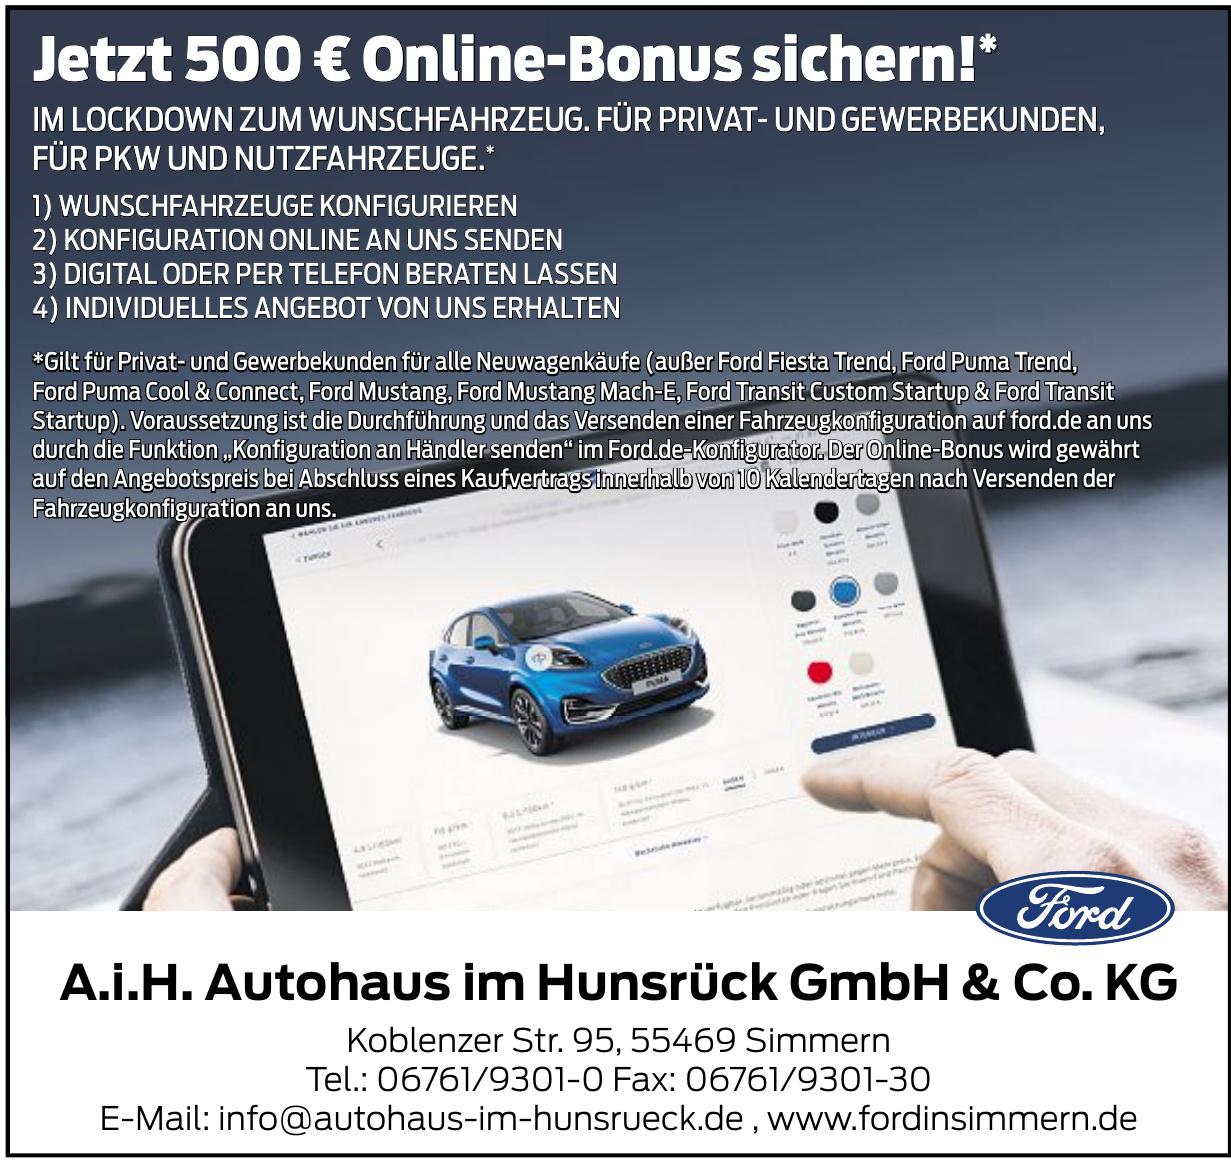 A.i.H. Autohaus im Hunsrück GmbH & Co. KG